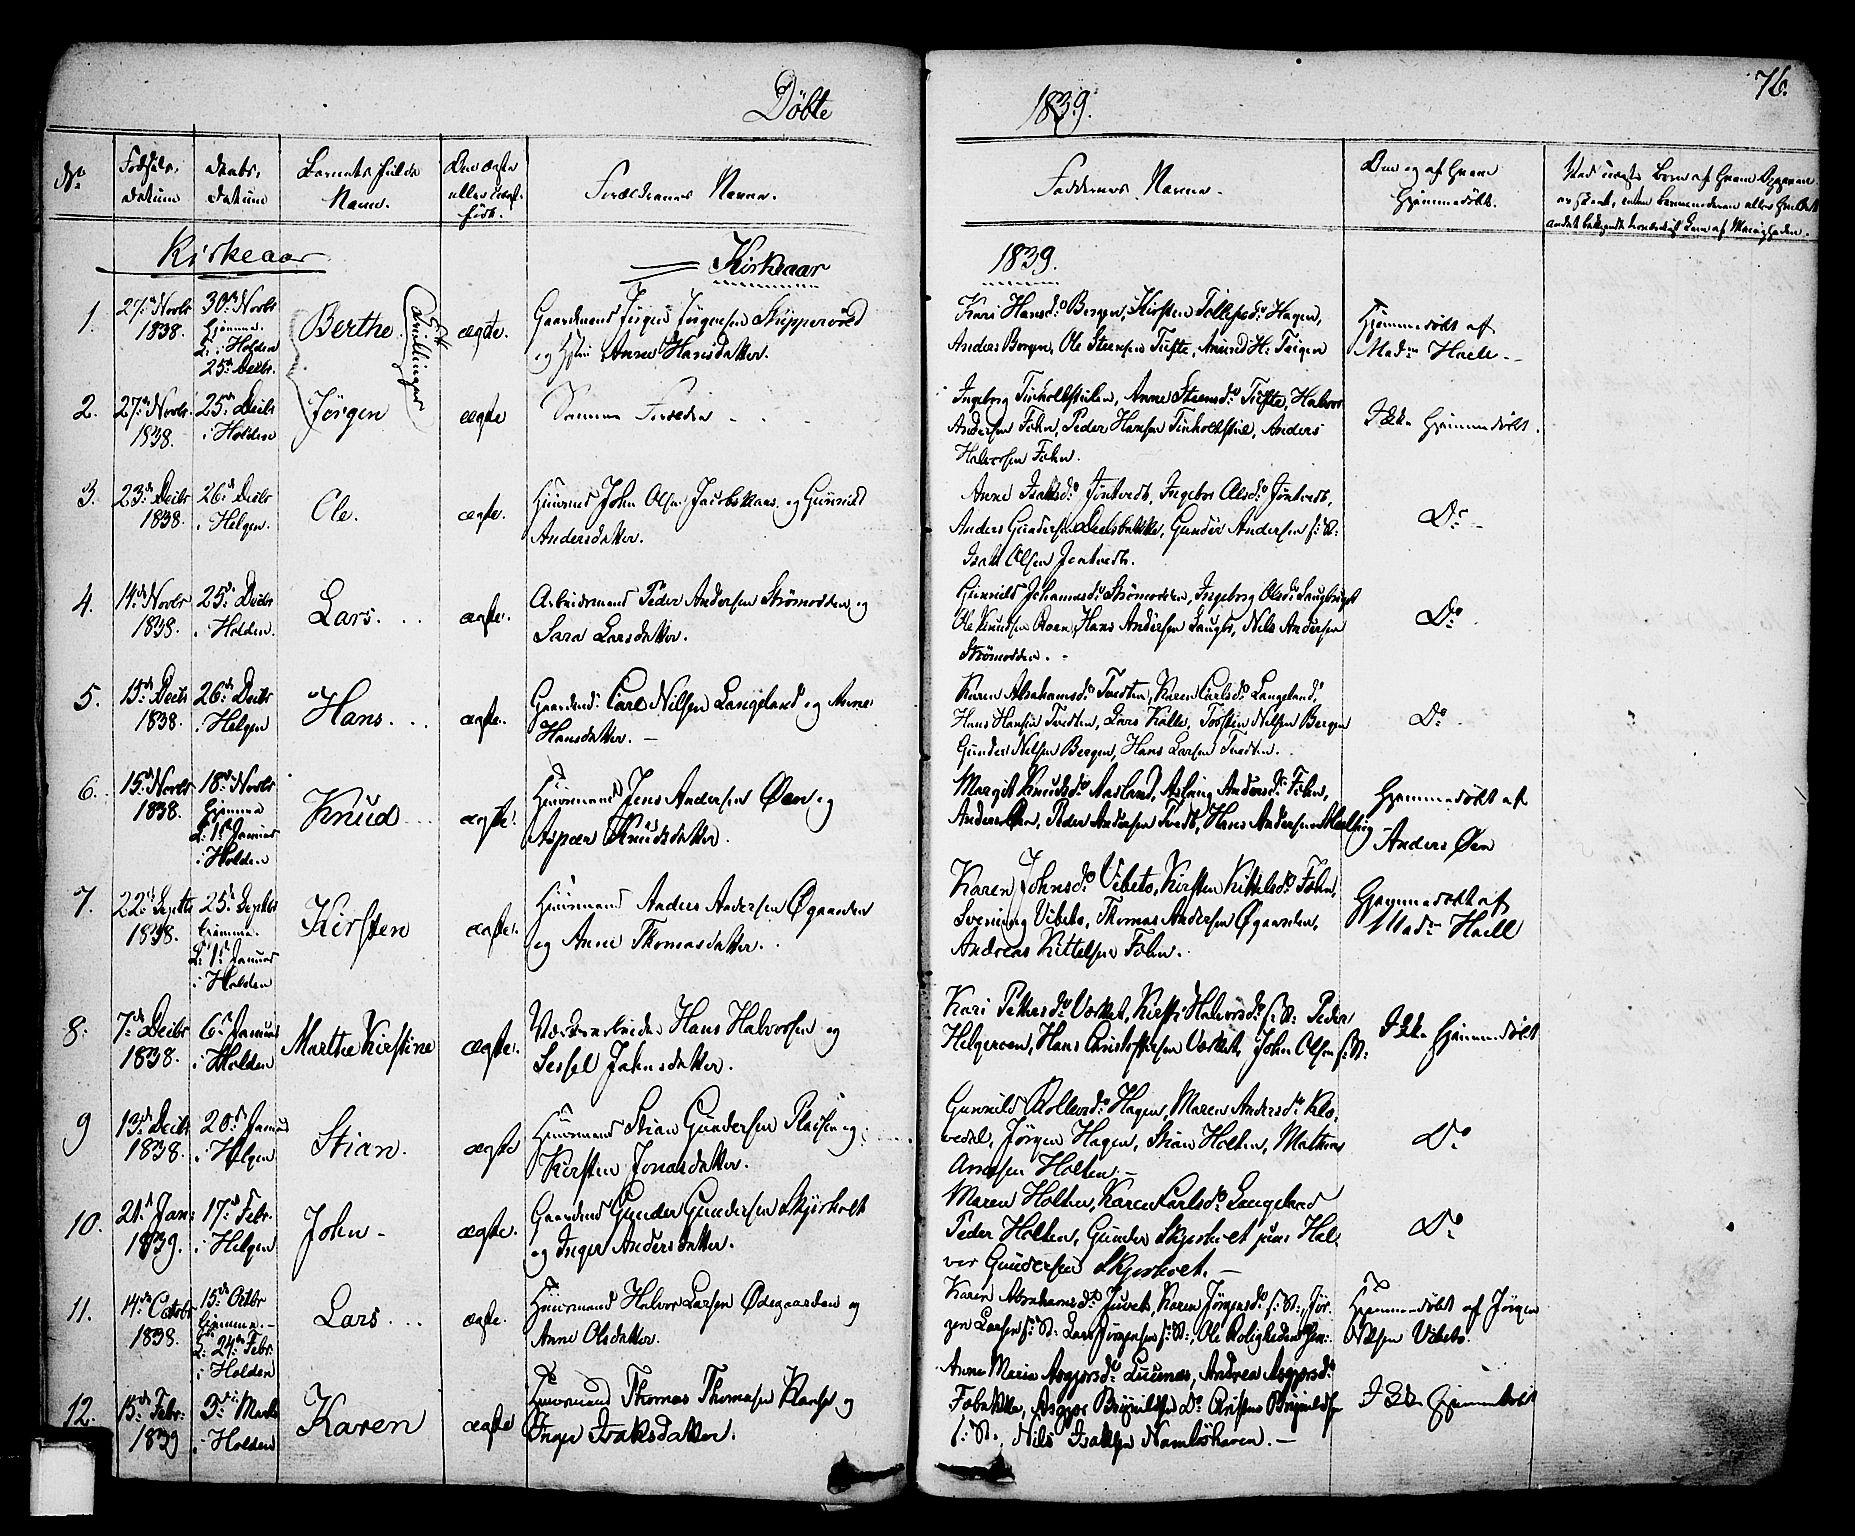 SAKO, Holla kirkebøker, F/Fa/L0004: Ministerialbok nr. 4, 1830-1848, s. 76